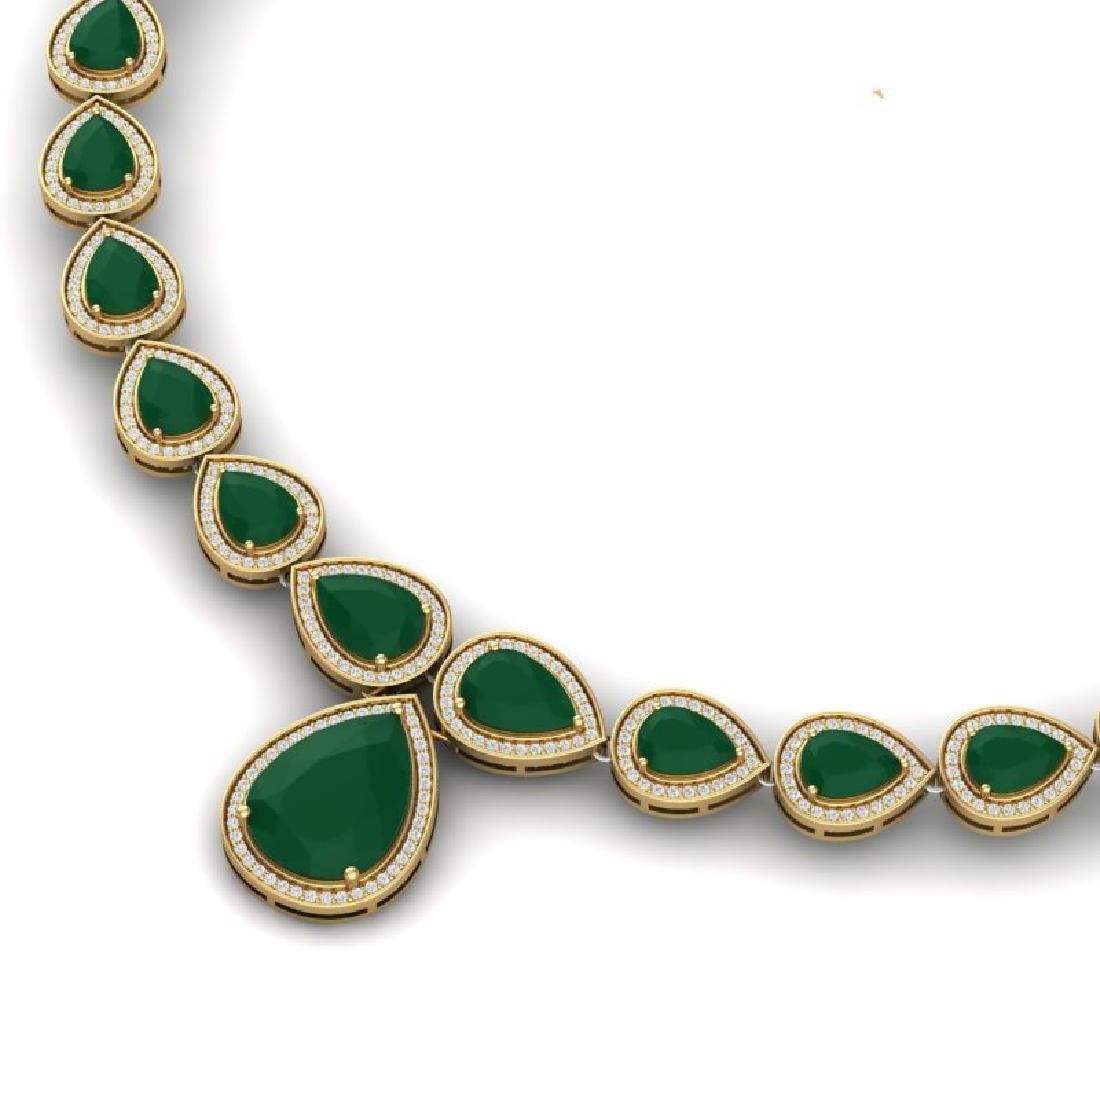 51.41 CTW Royalty Emerald & VS Diamond Necklace 18K - 2